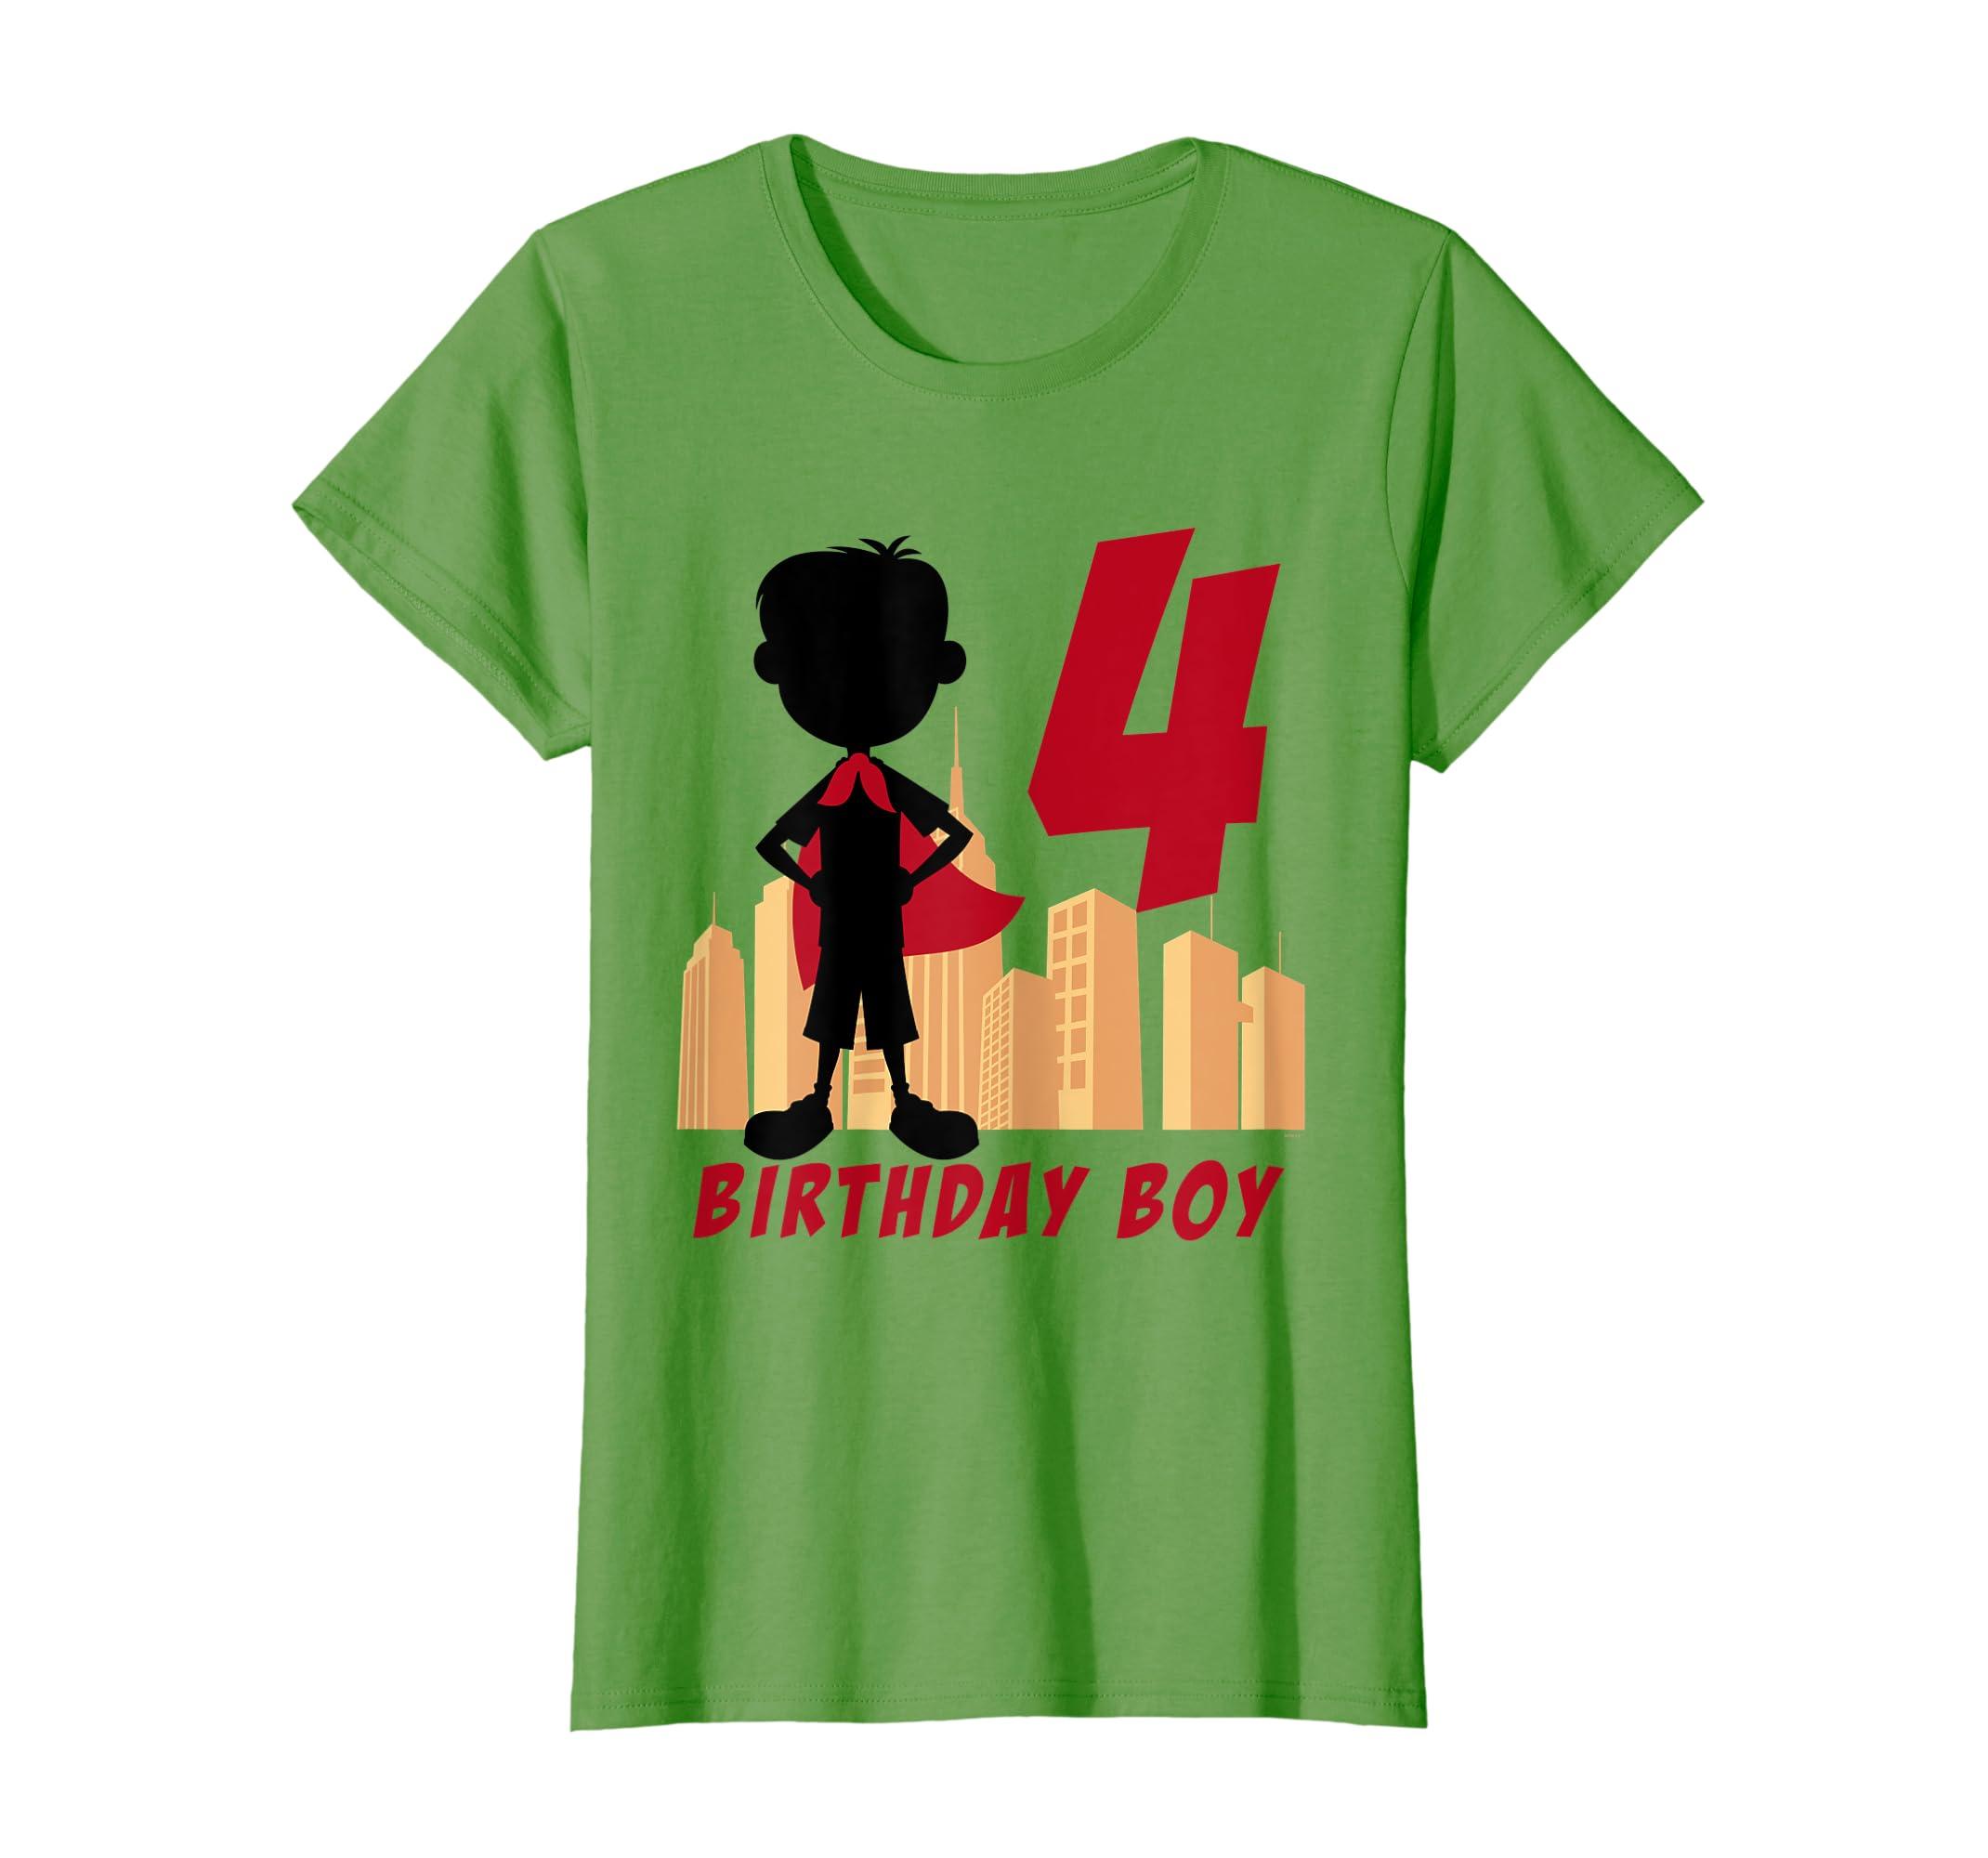 Amazon Kids 4th Birthday Comic Superhero T Shirt For 4 Yr Old Boys Clothing